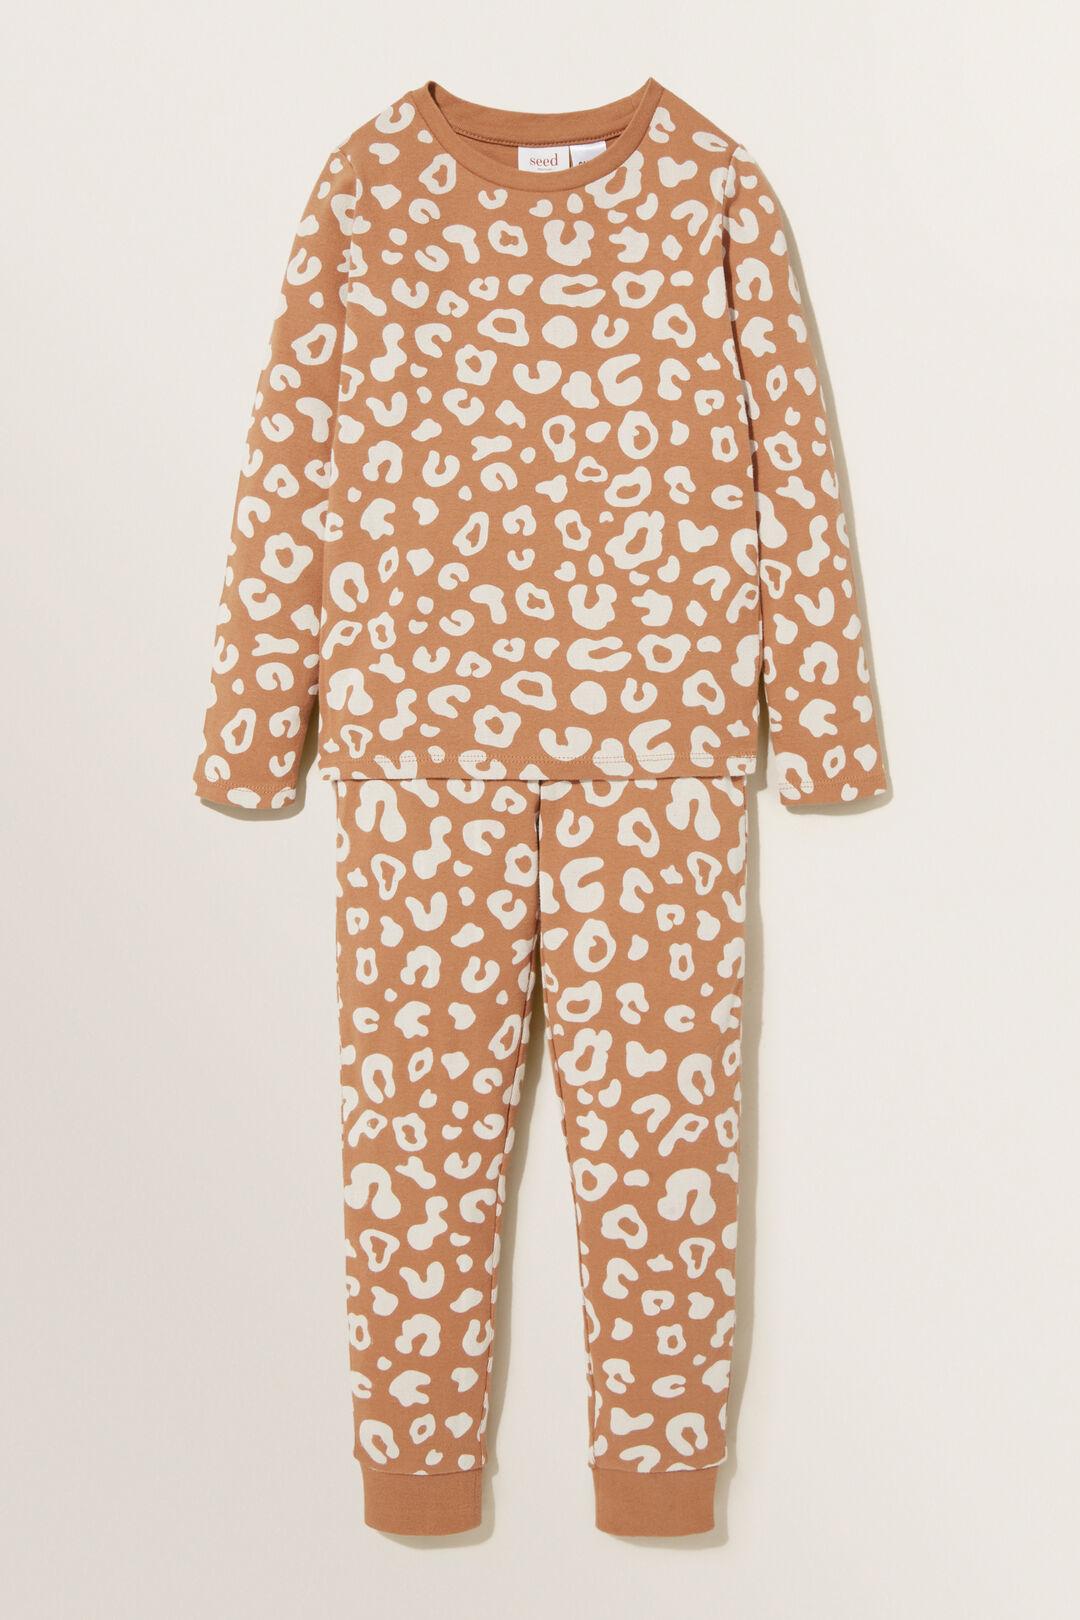 Ocelot Long Sleeve  Pyjamas  GINGER  hi-res